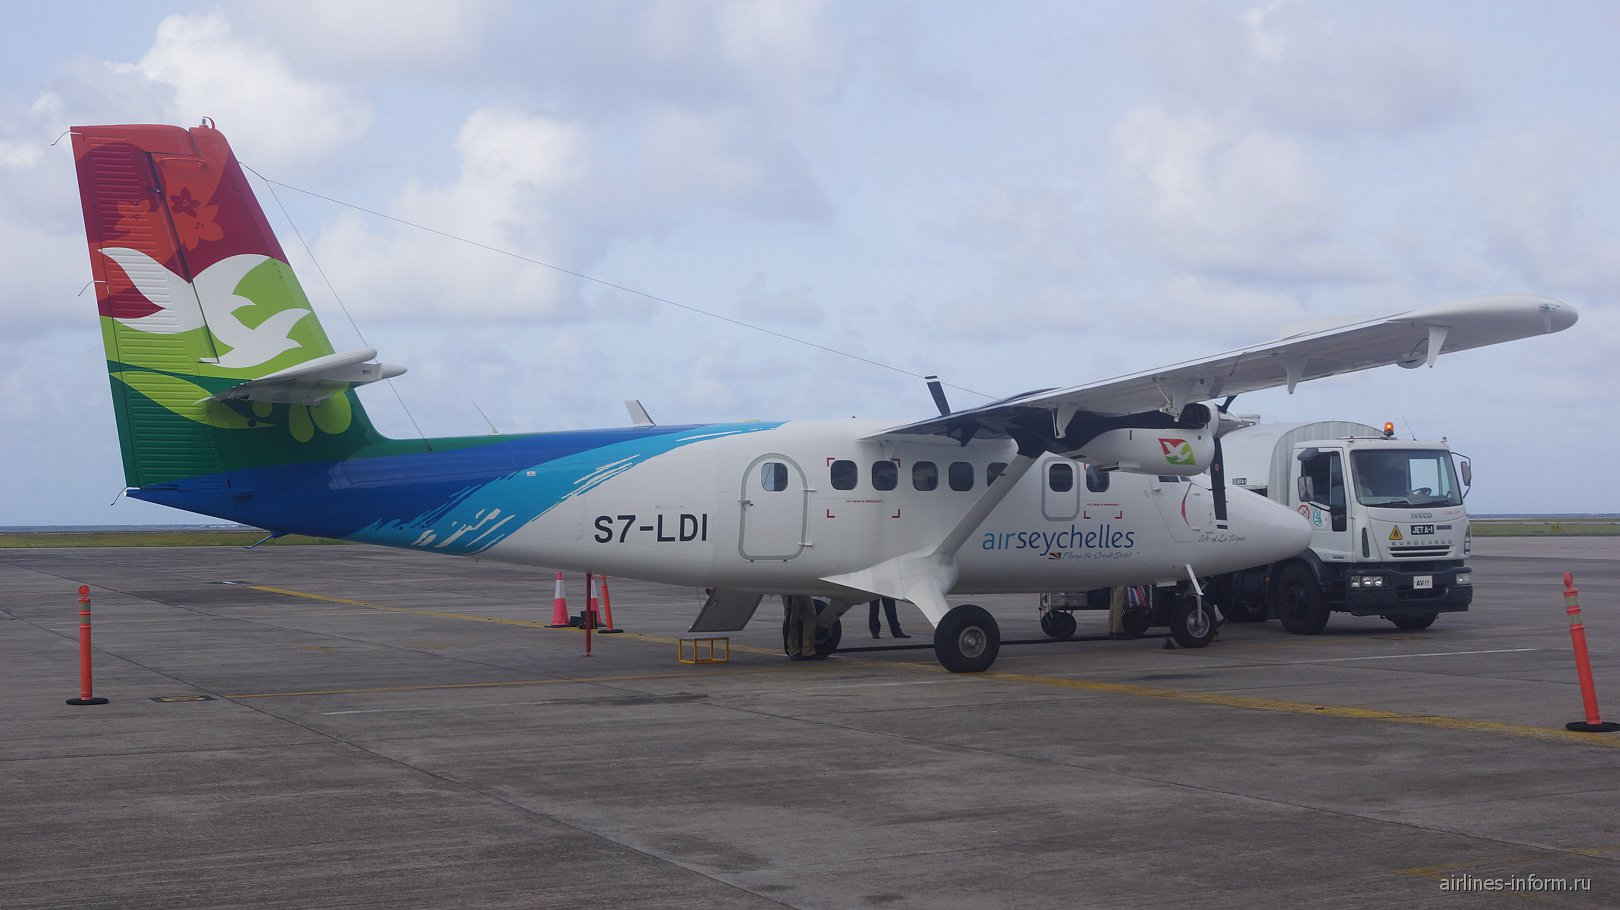 Самолет DHC-6 Twin Otter авиакомпании Air Seychelles в аэропорту Маэ Сейшелы